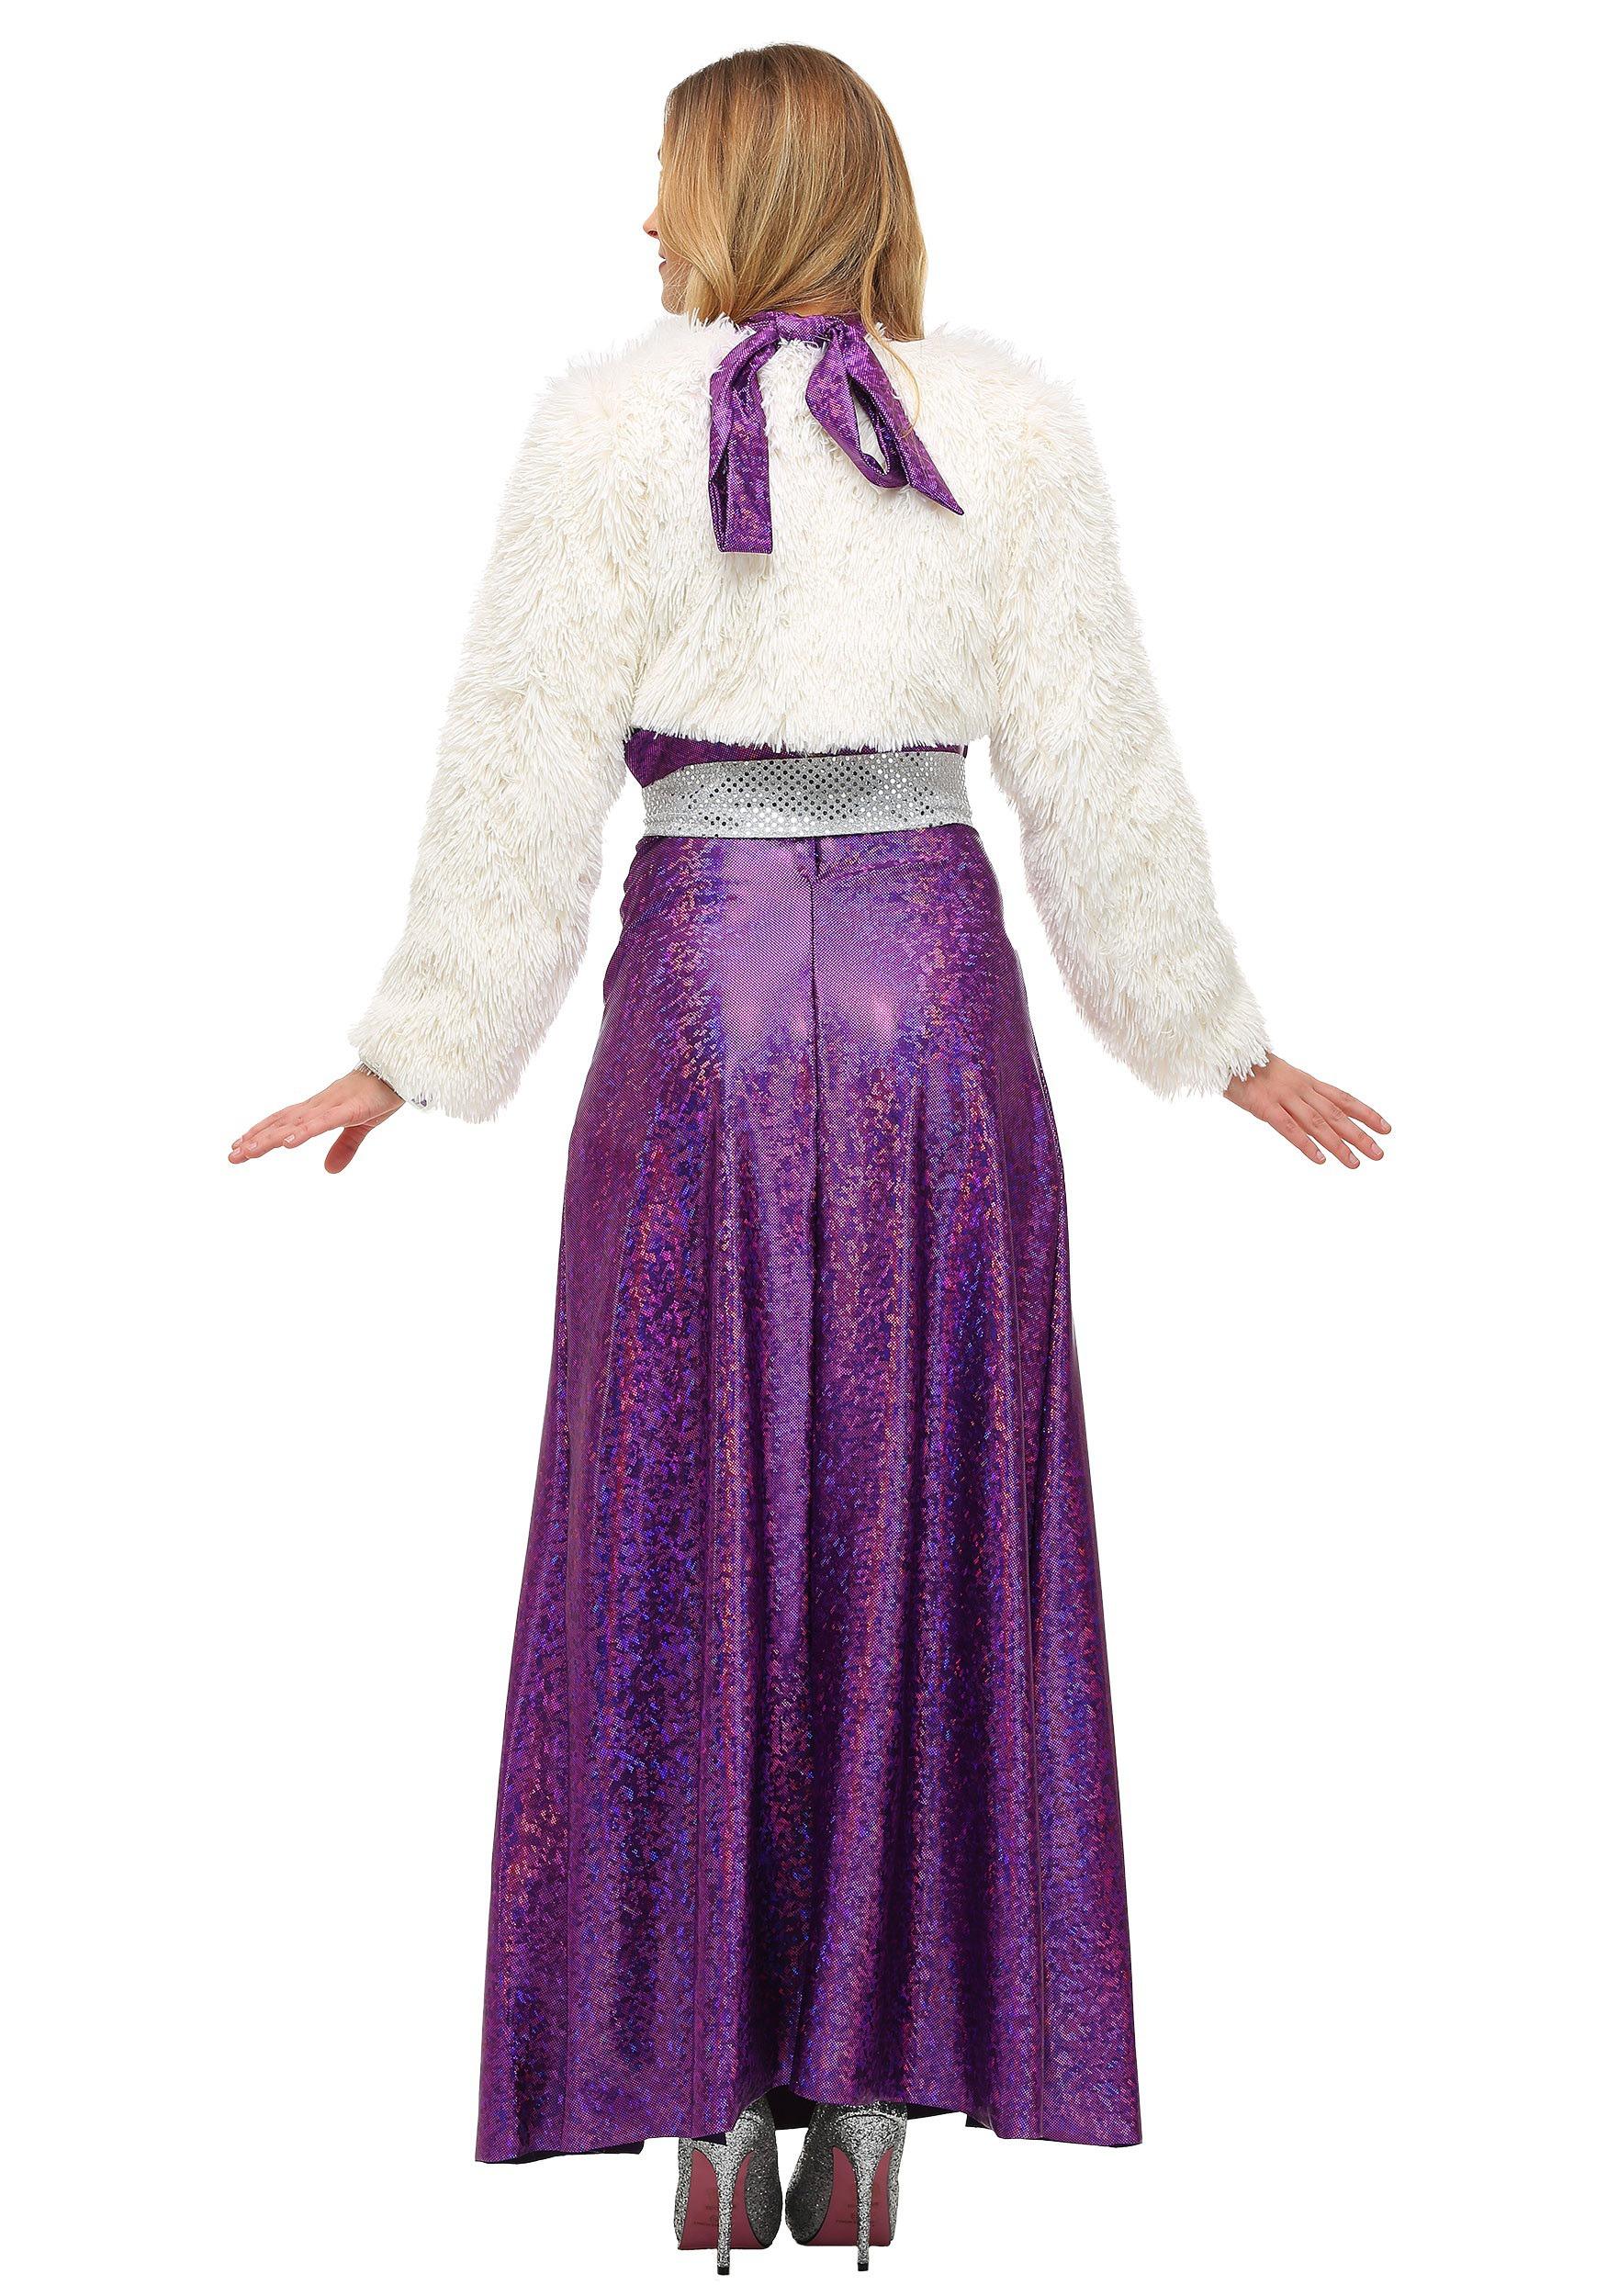 Women's Disco Ball Diva Costume Dress With accessories